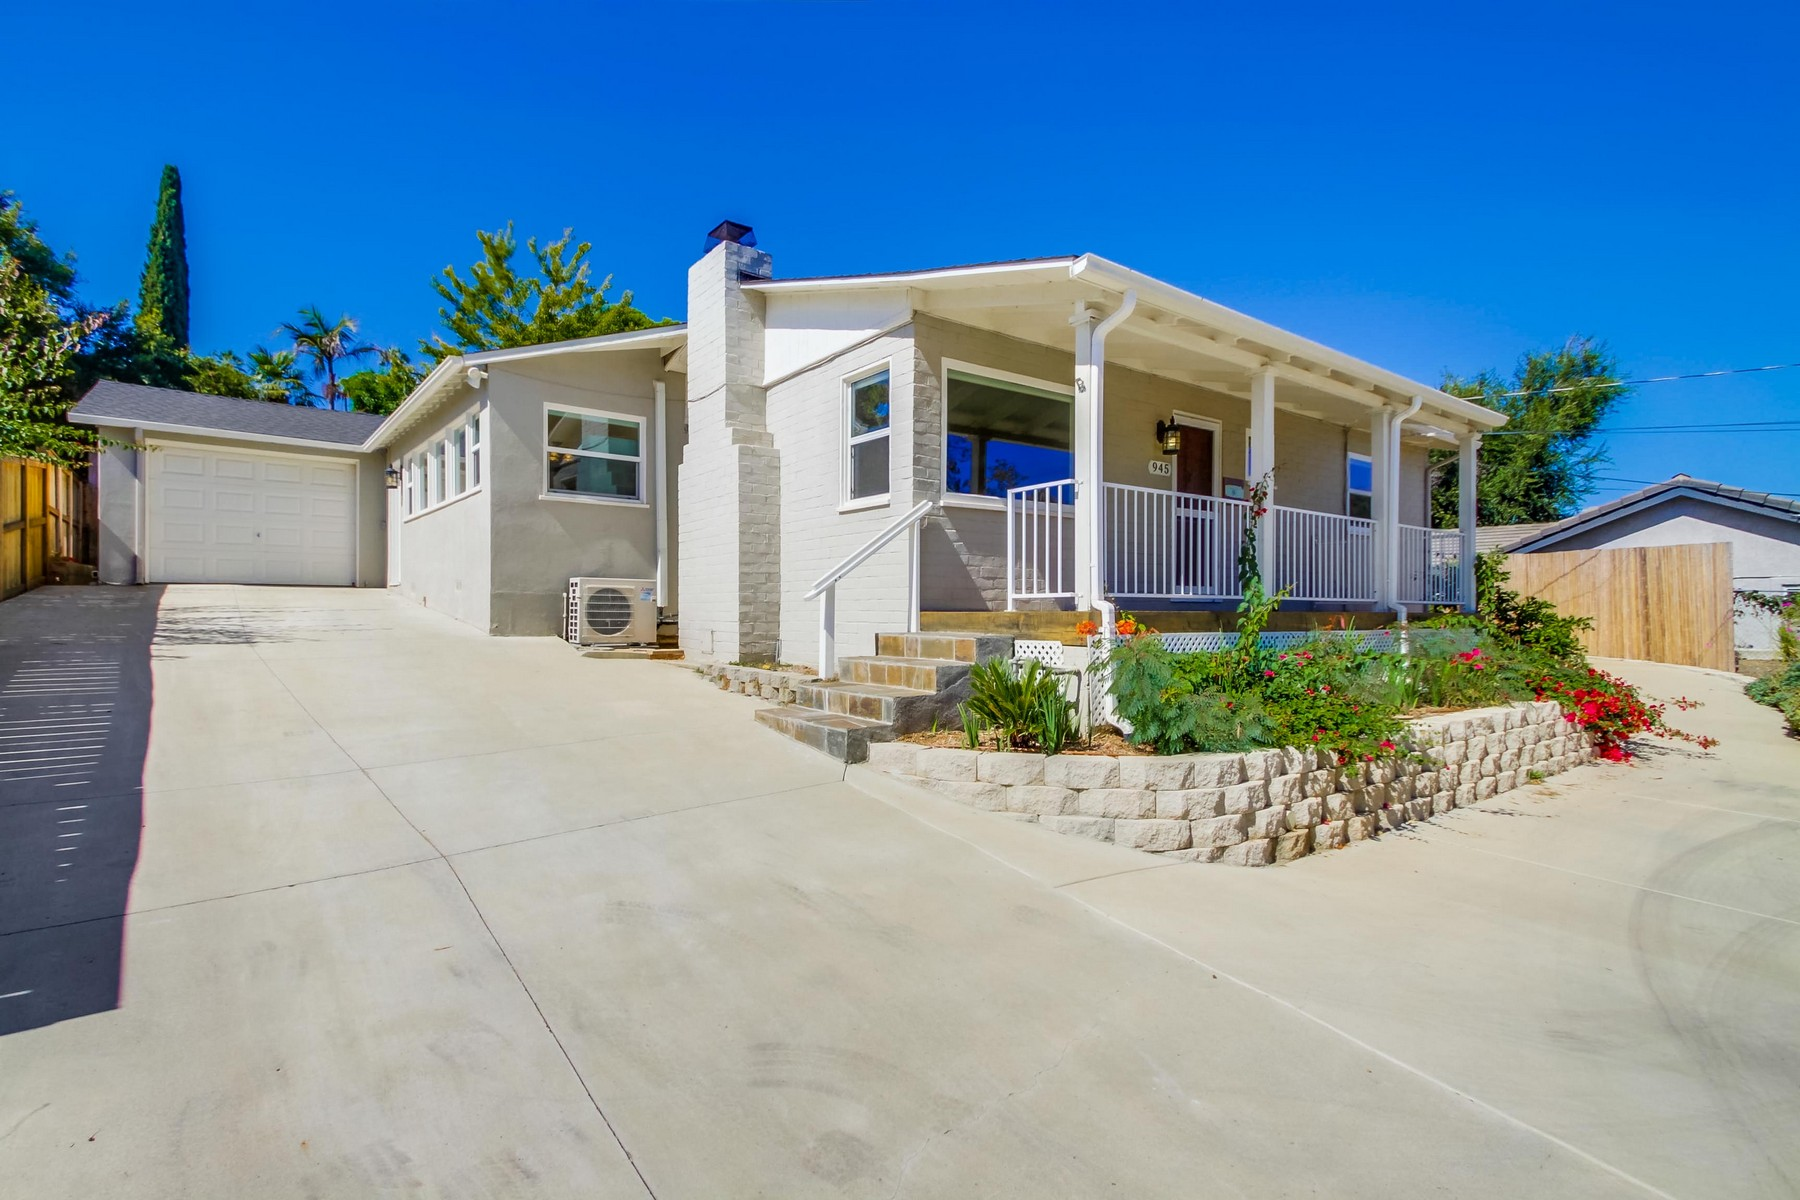 Single Family Homes for Sale at 945 Eucalyptus Avenue 945 Eucalyptus Ave Vista, California 92084 United States